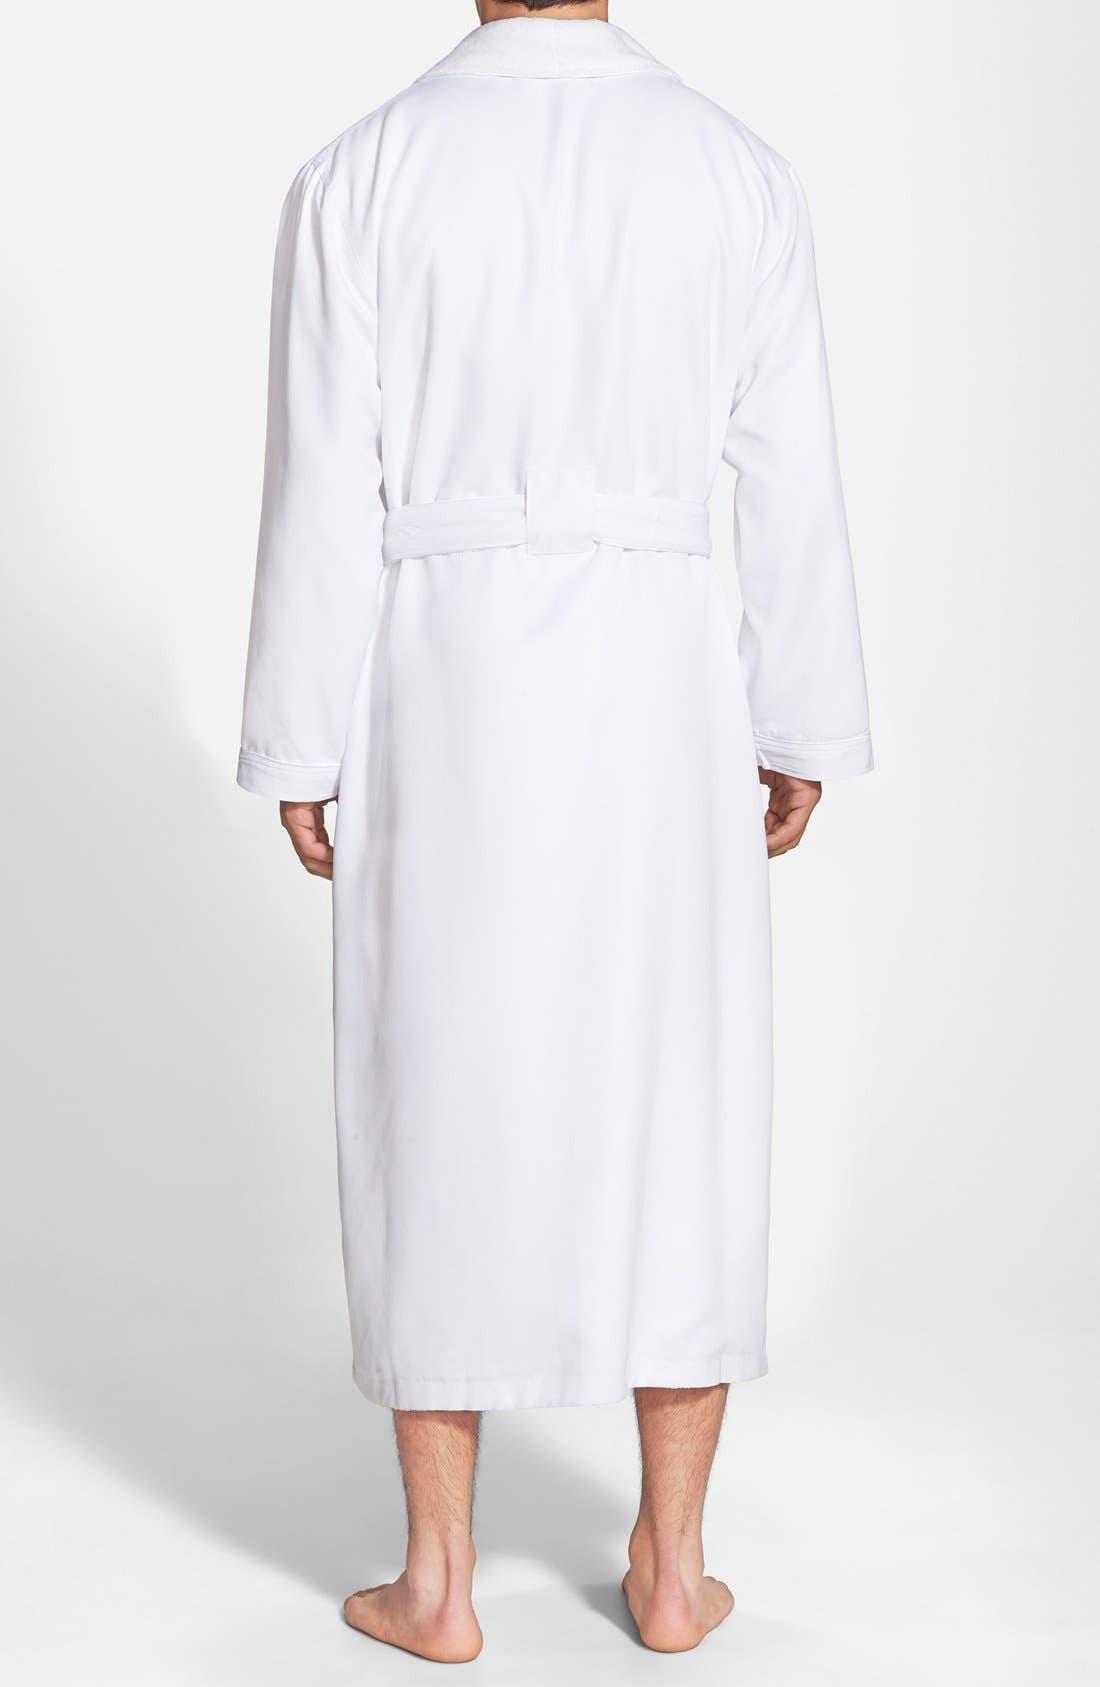 MAJESTIC INTERNATIONAL, Fleece Lined Robe, Alternate thumbnail 2, color, WHITE